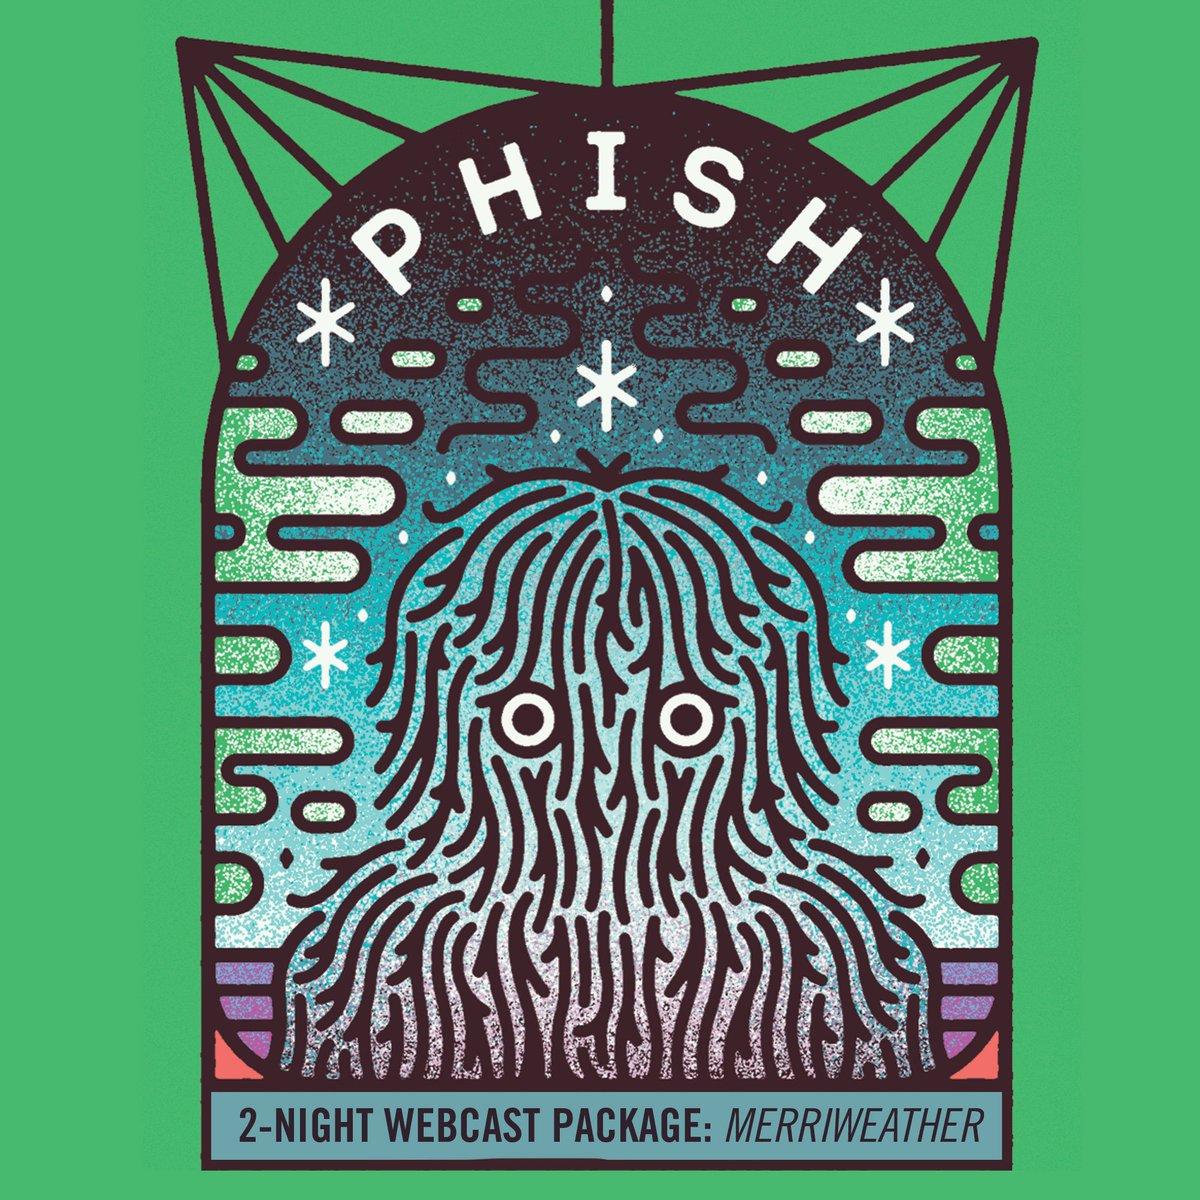 Tonight Is Last Night For Alternate >> Phish On Twitter Https T Co Vmscgcab83 Is Back Tonight